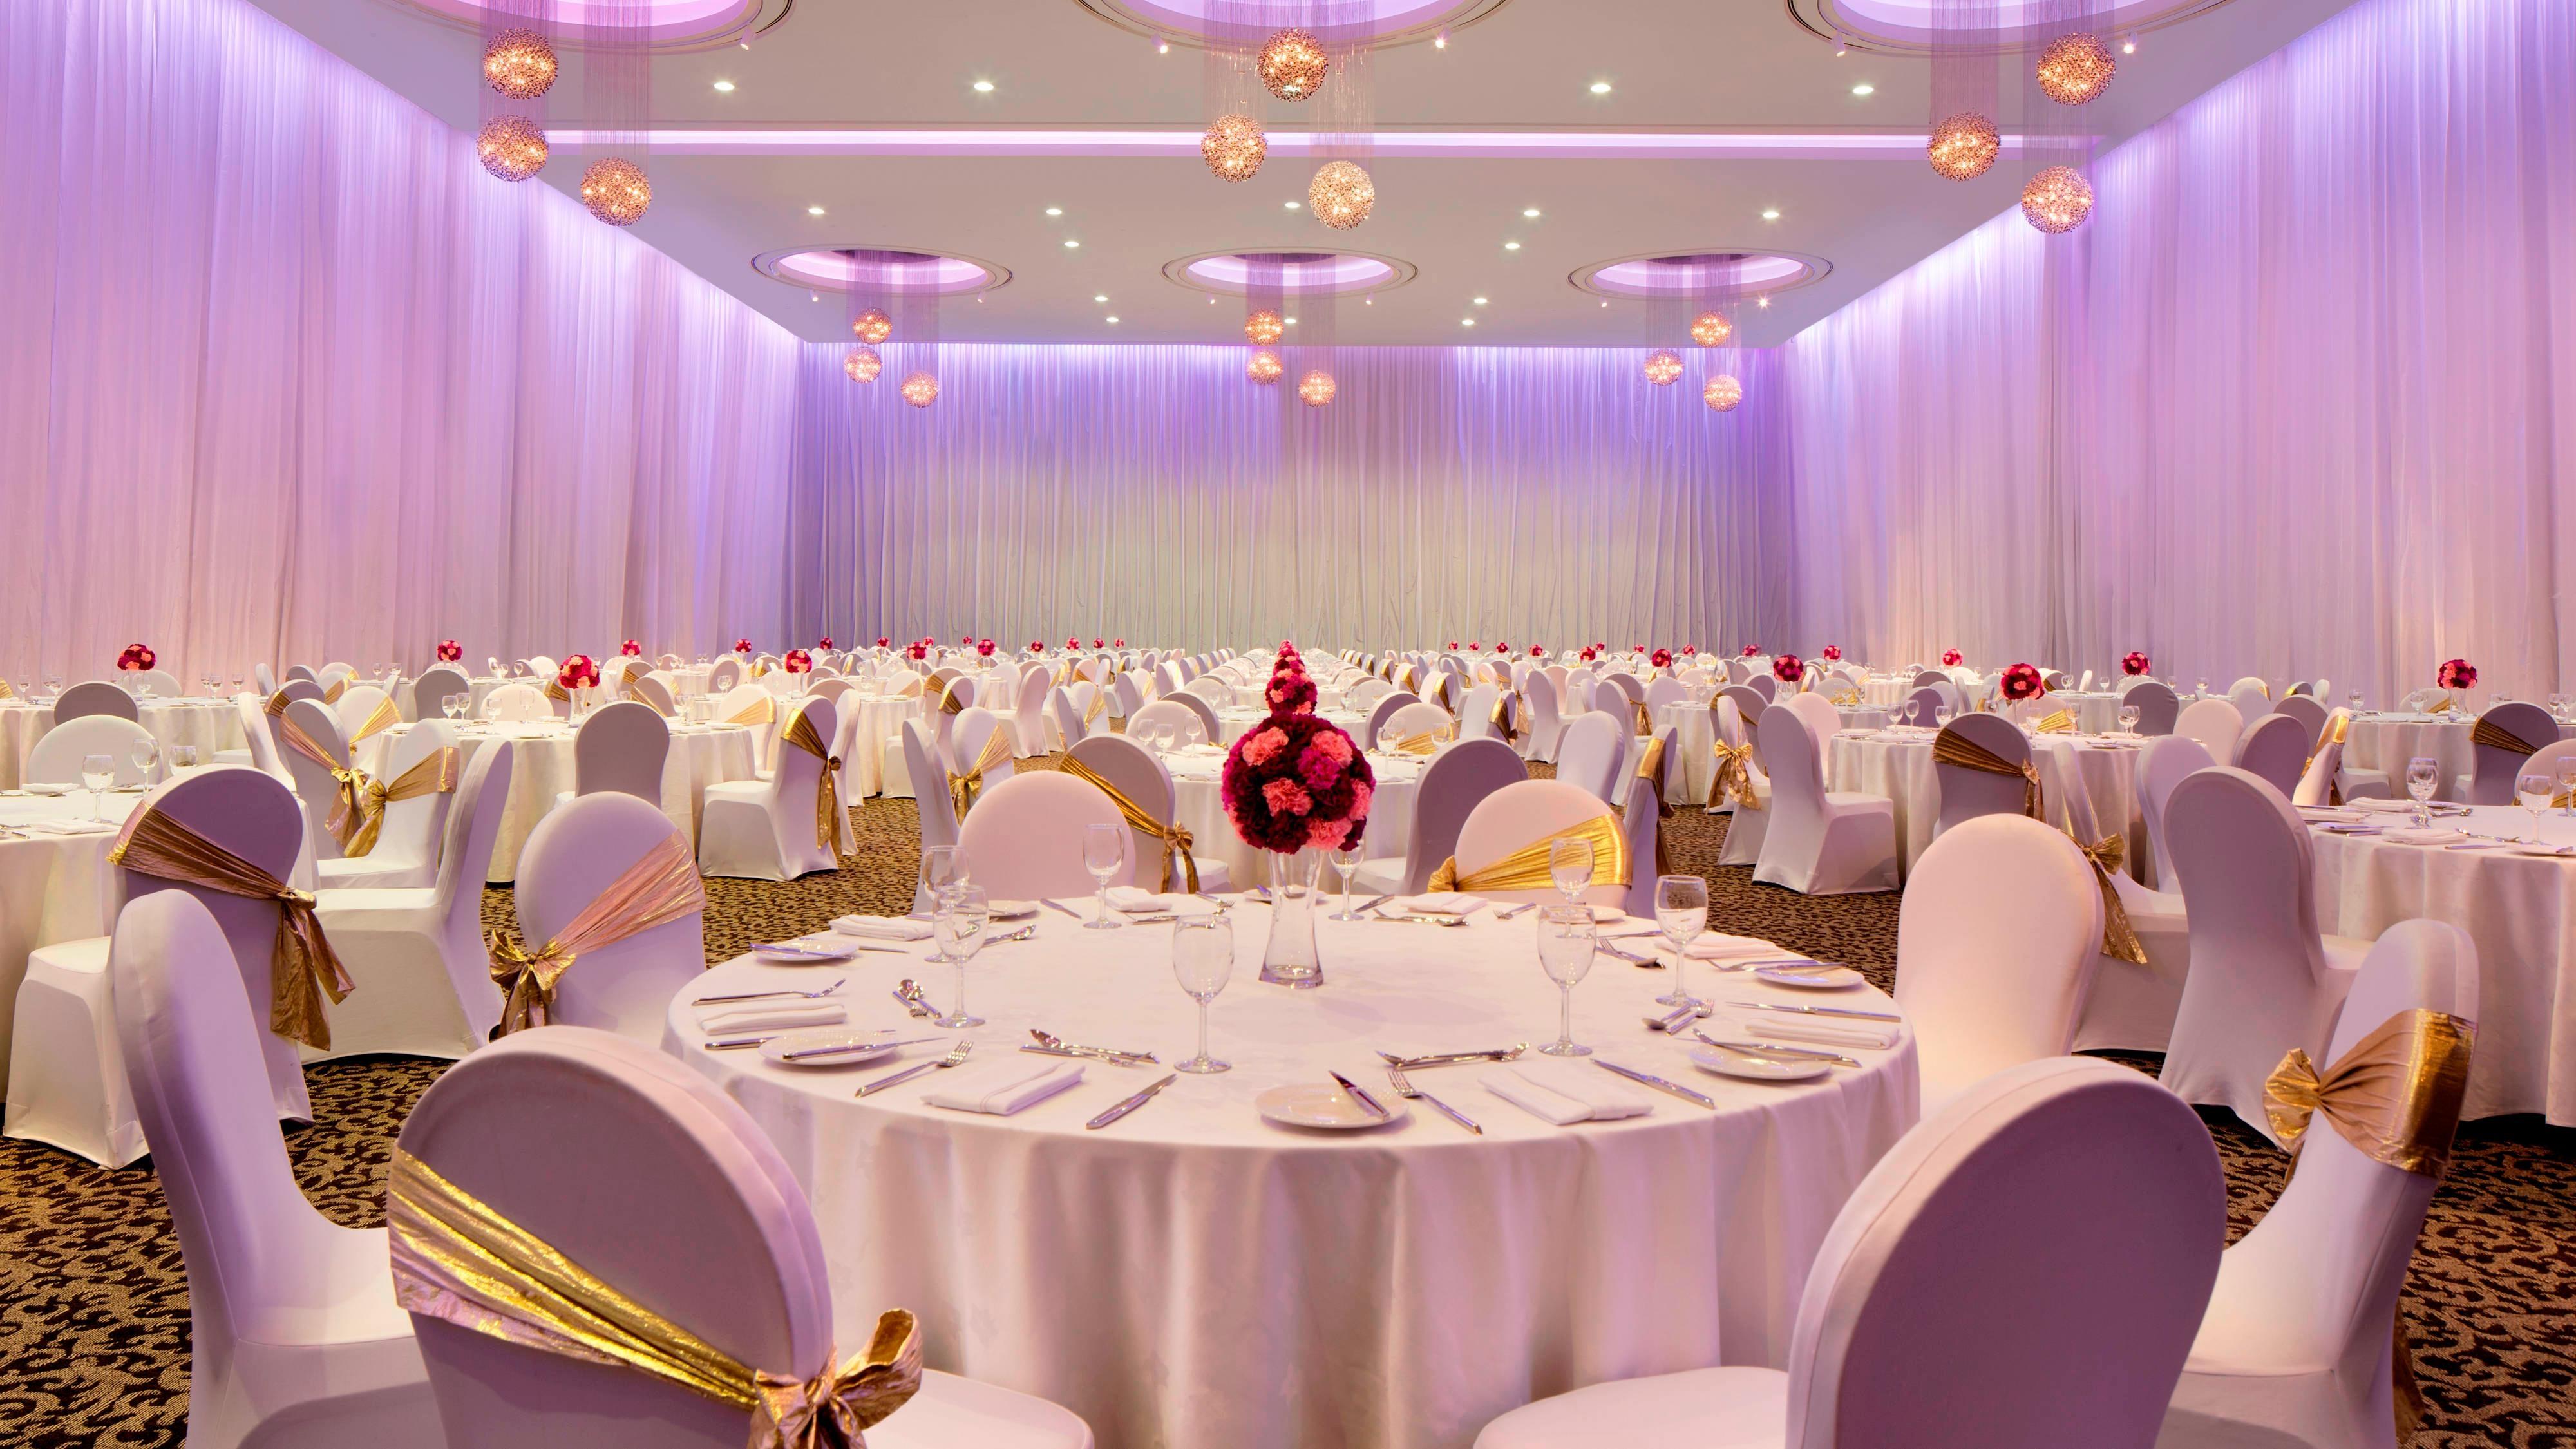 Great Ballroom